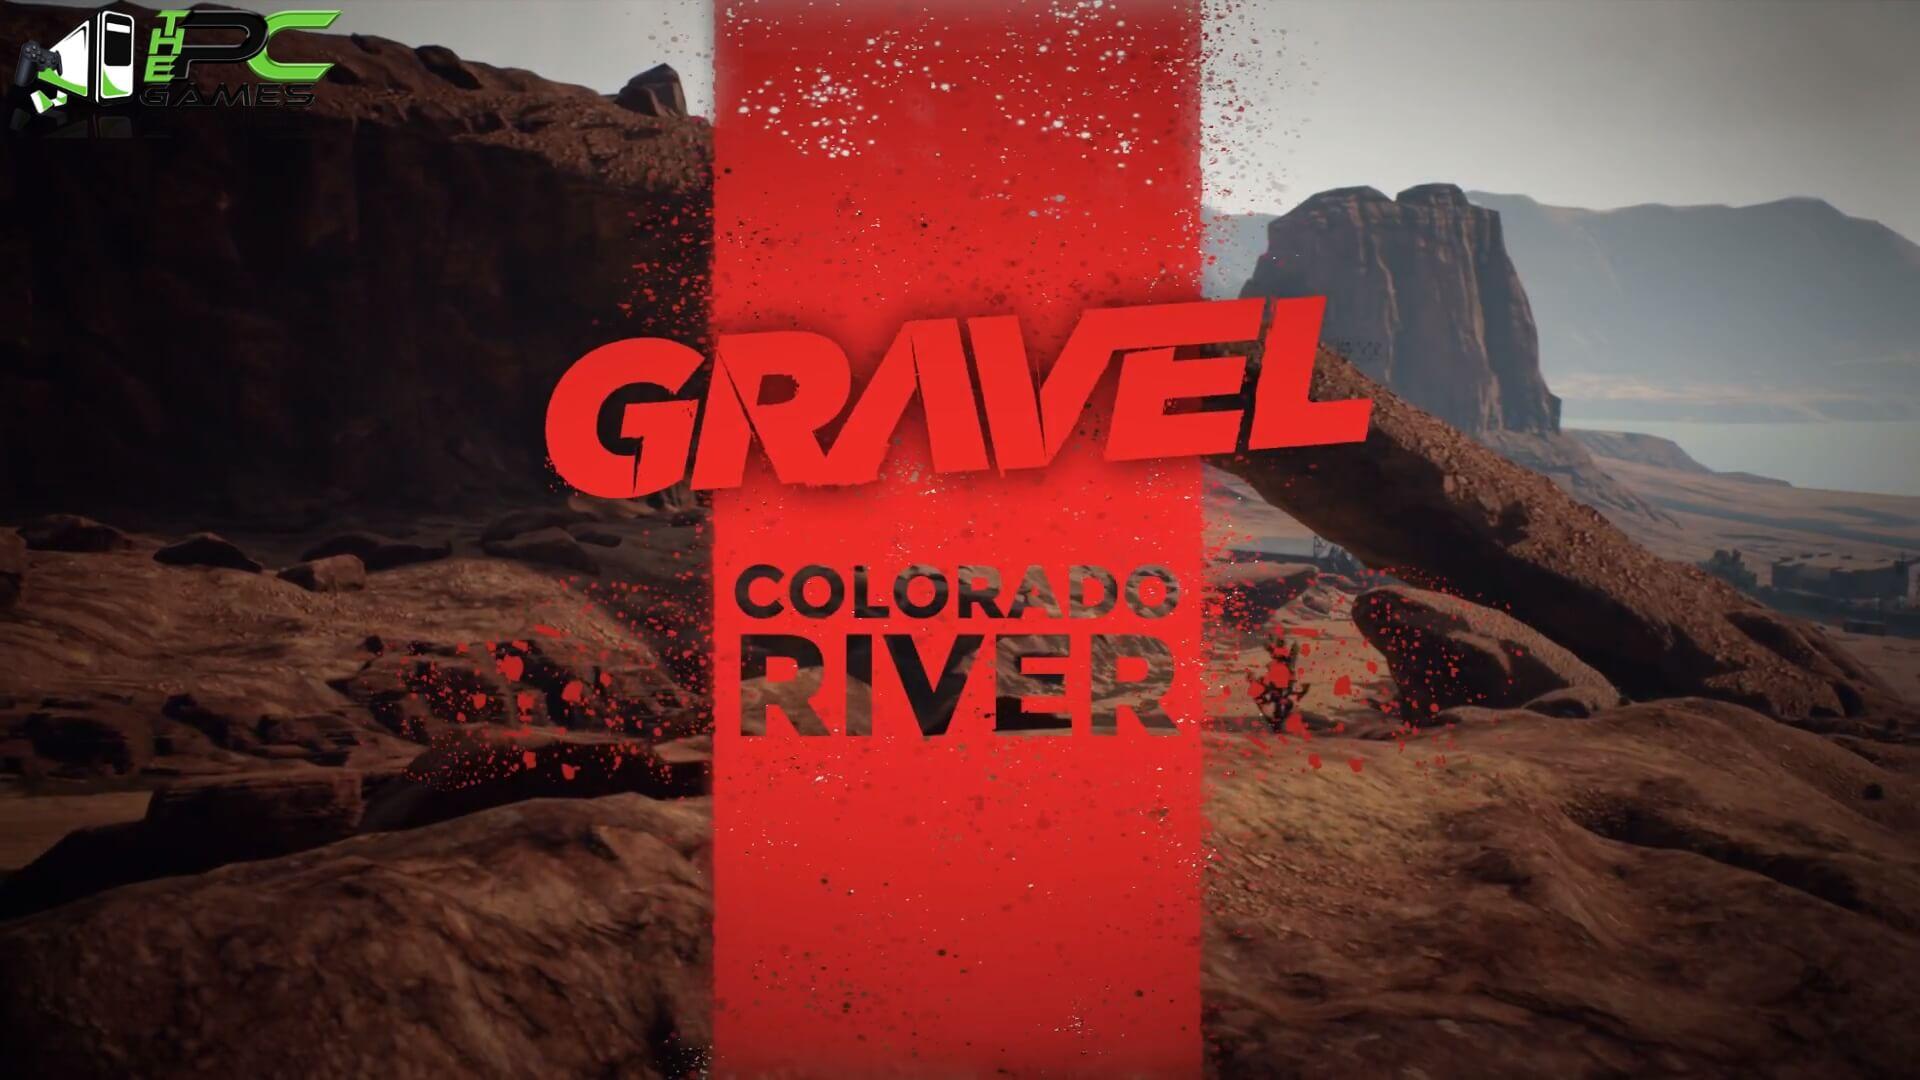 Gravel Colorado River game free download